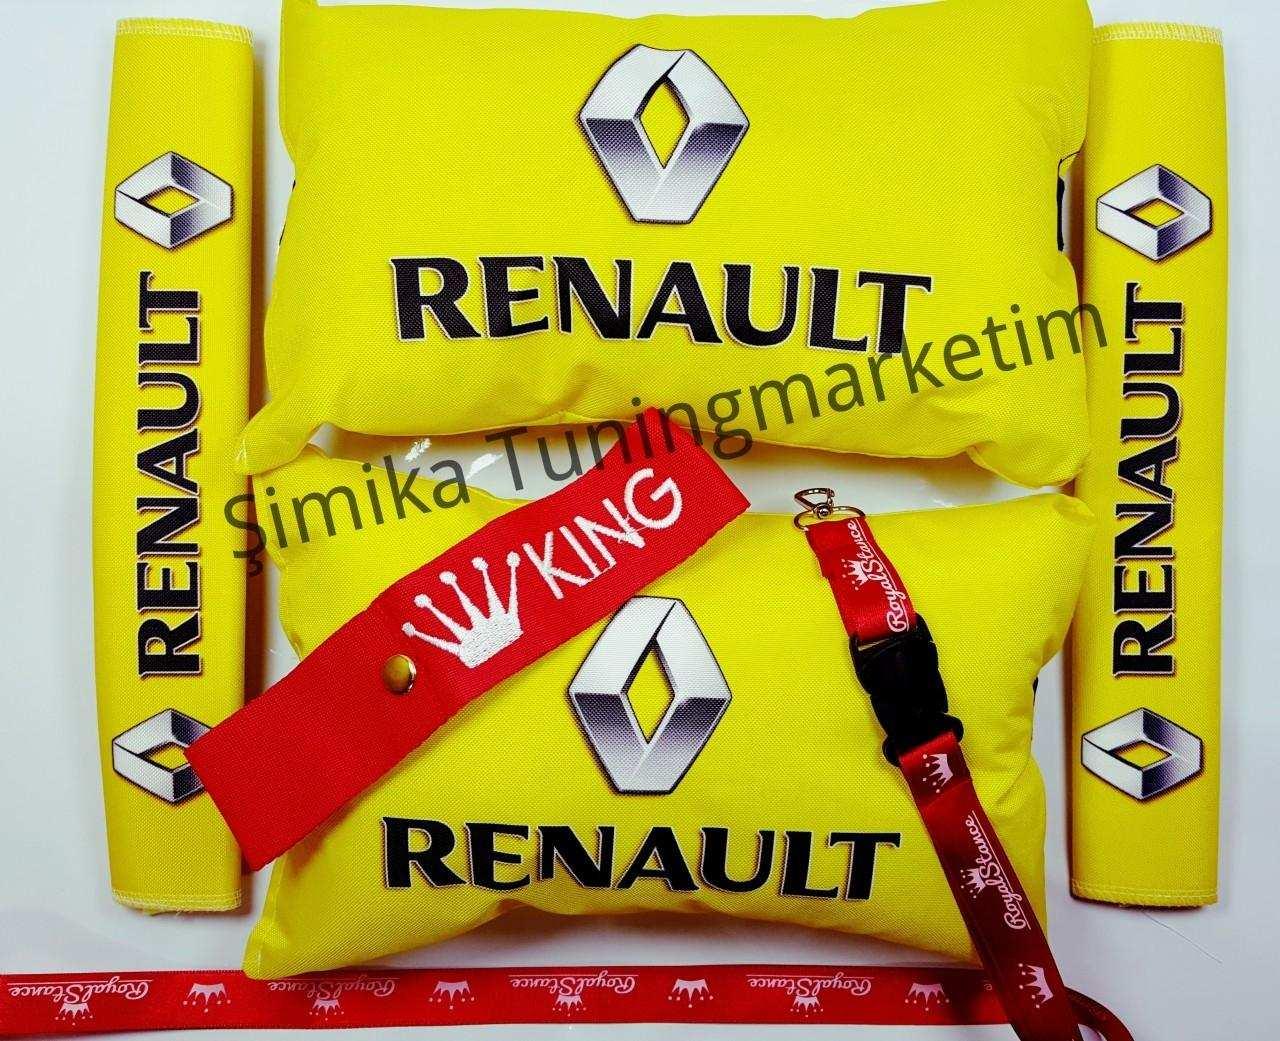 Renault YASTIK LASTİKLİ 2 Lİ VE 2 KEMER KILIFI+ayna ipi ve tampo